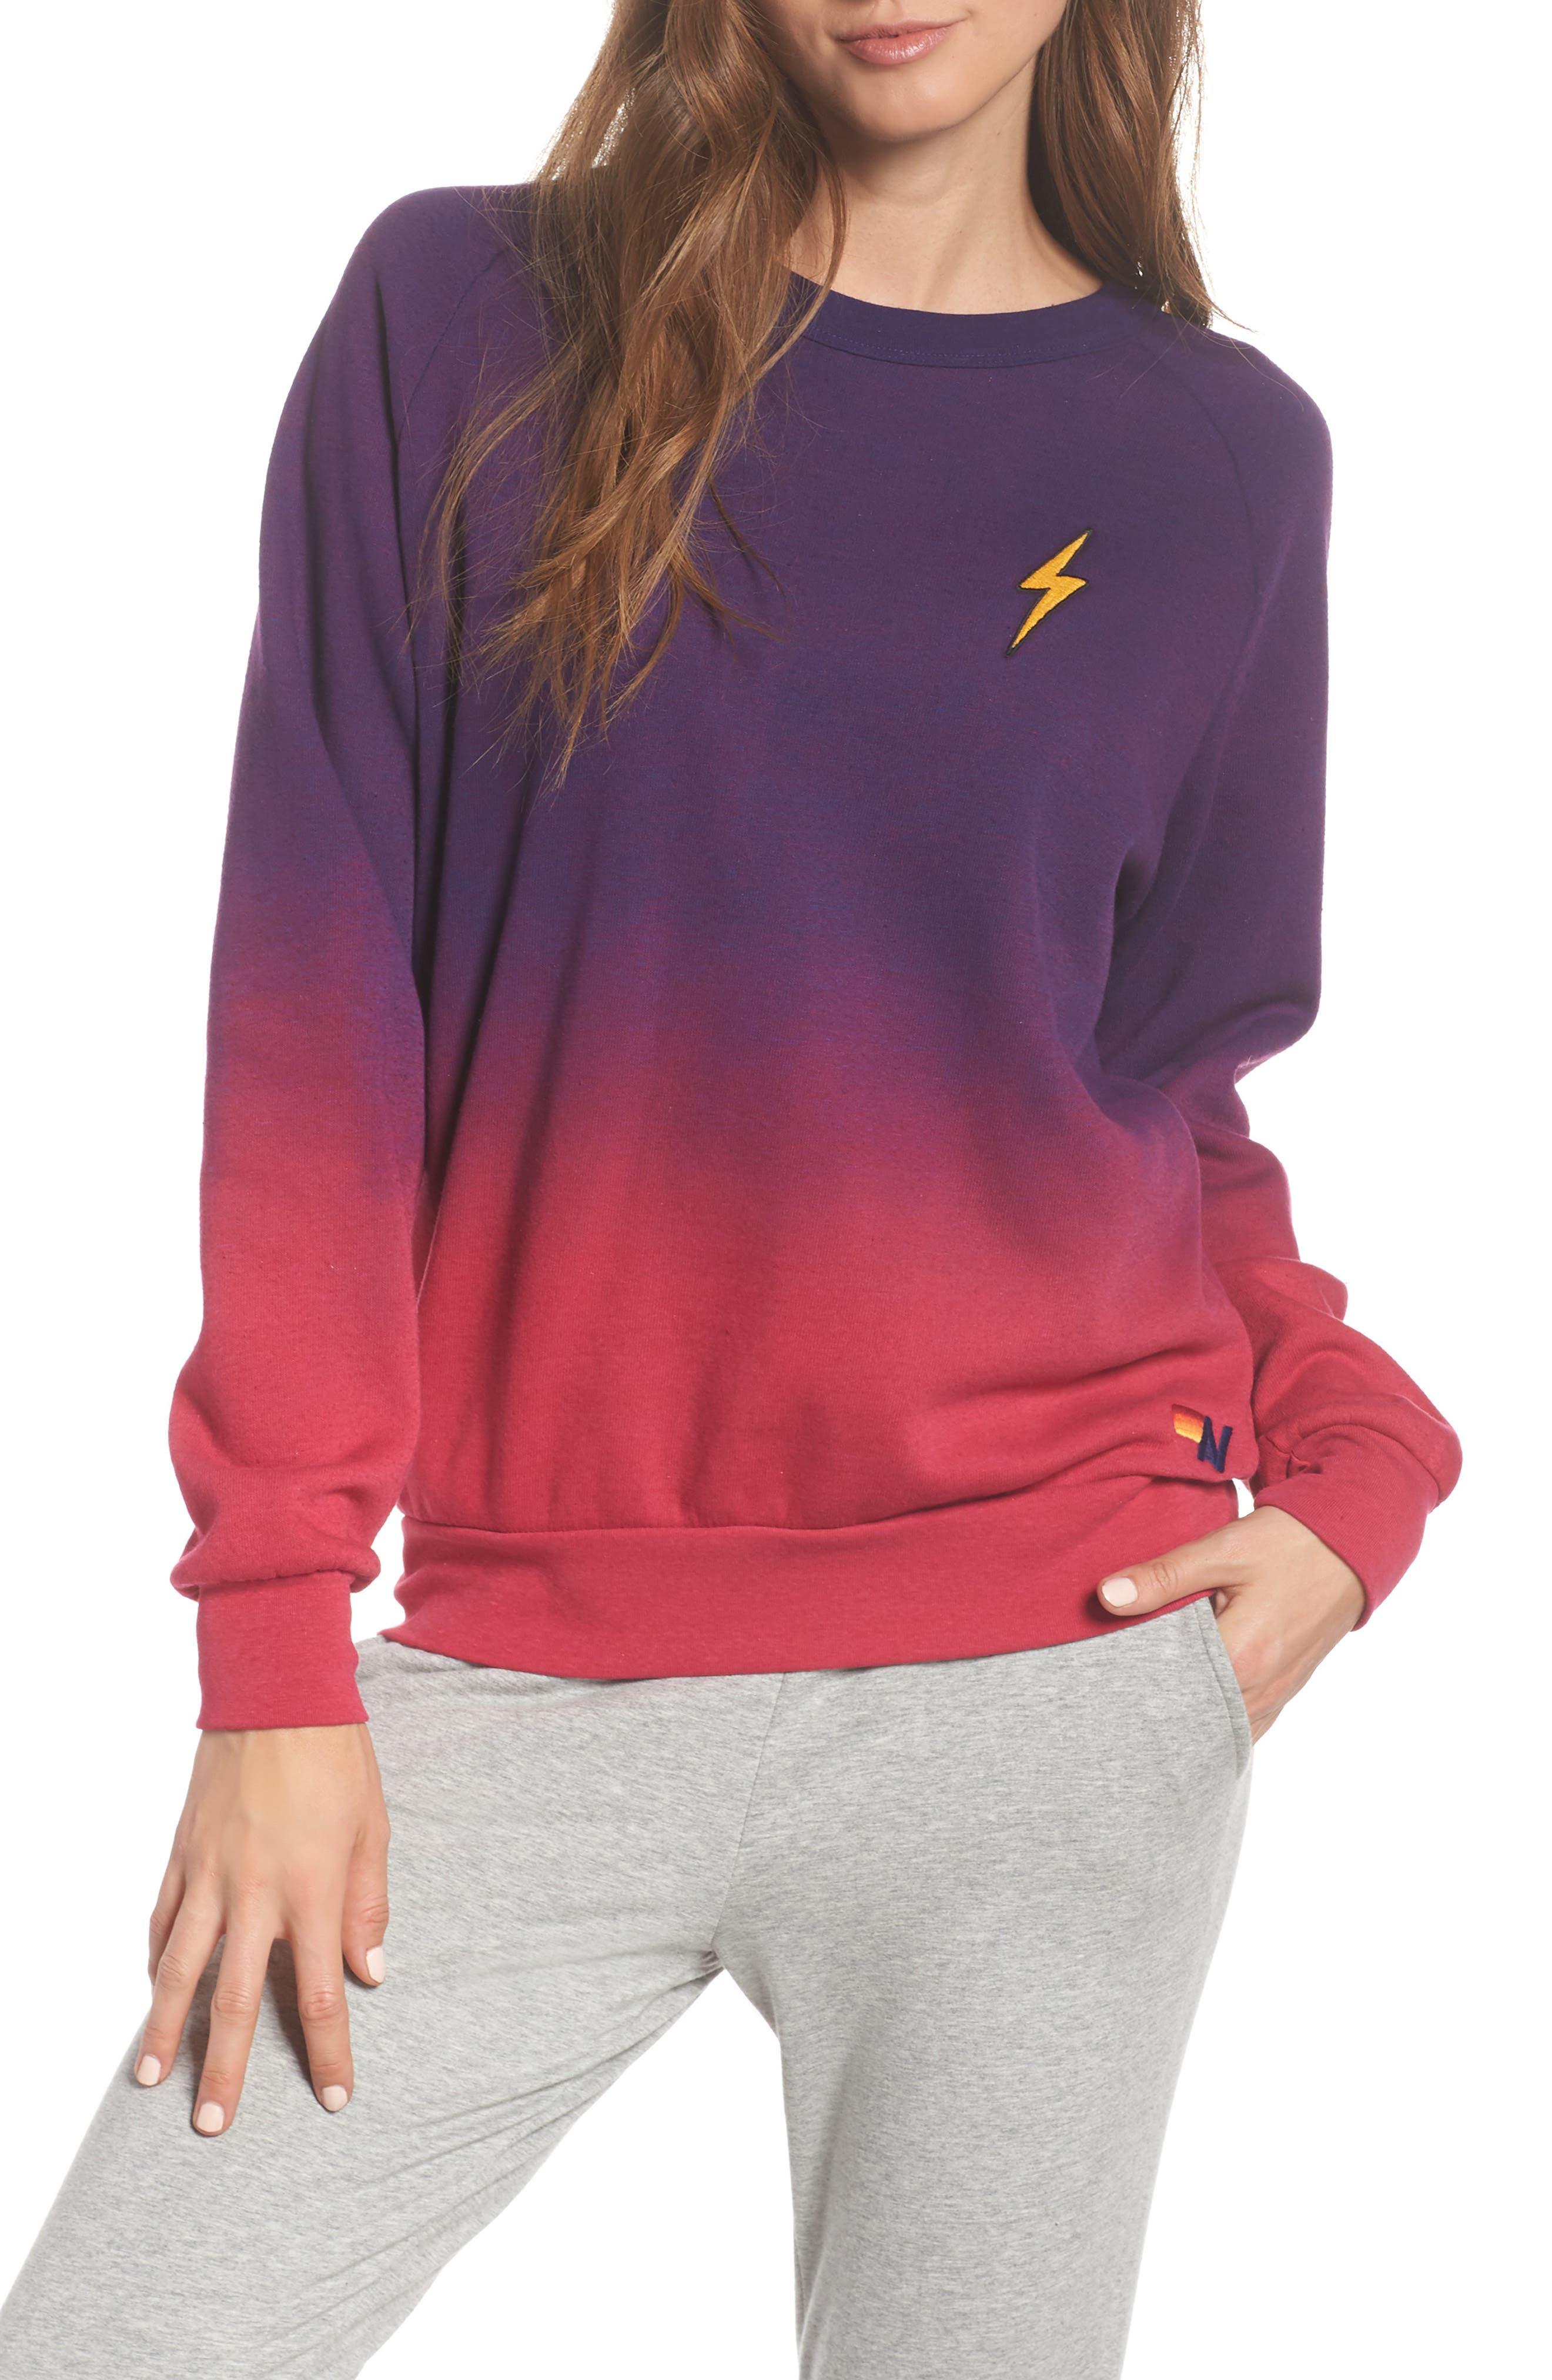 AVIATOR NATION Faded Bolt Sweatshirt in Rose / Purple